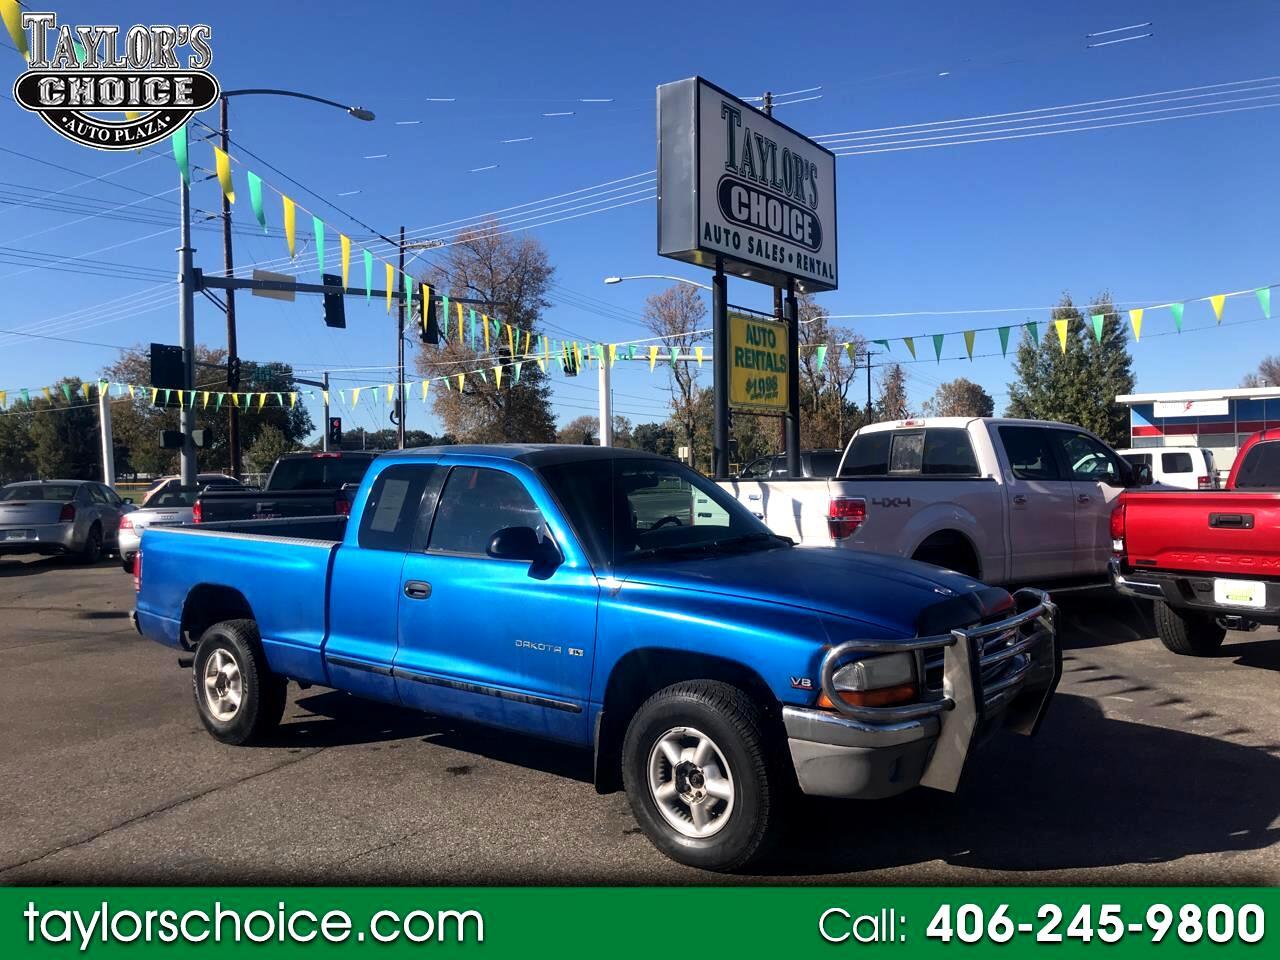 1999 Dodge Dakota Club Cab 4WD